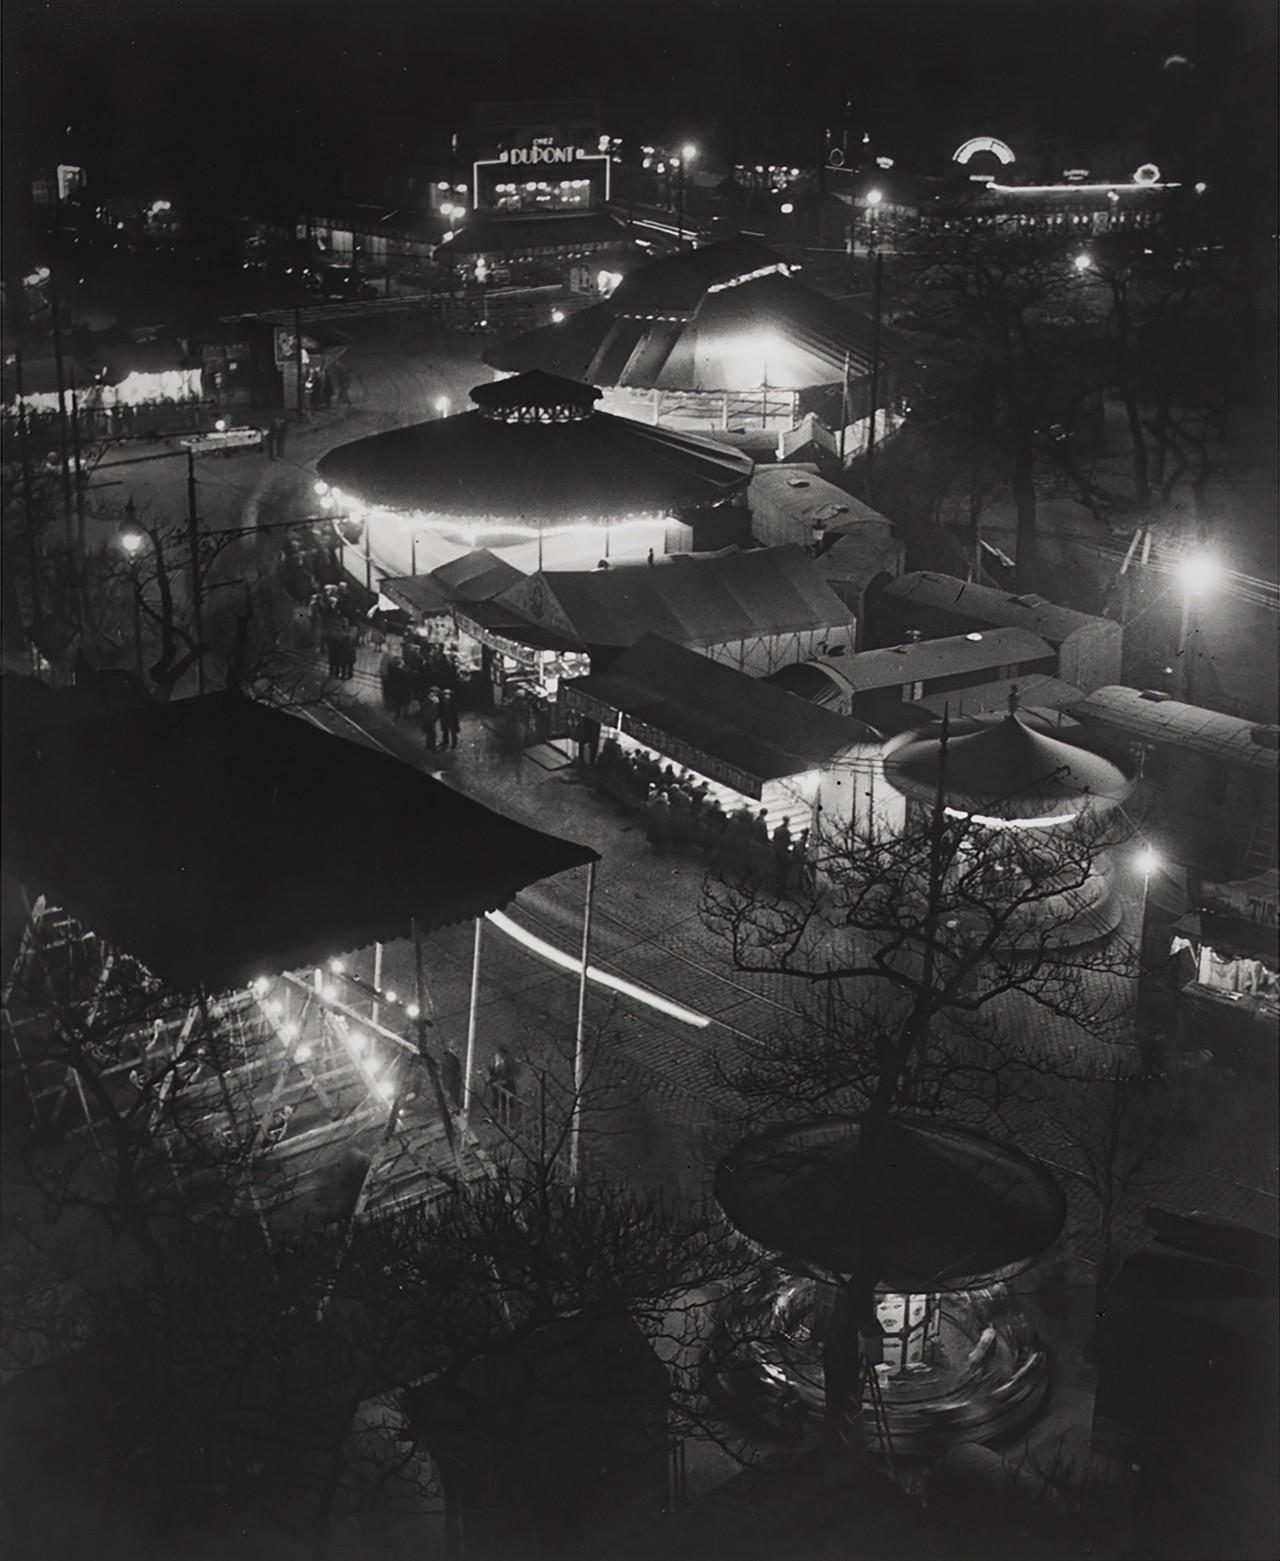 Ярмарка развлечений, 1931. Фотограф Брассаи